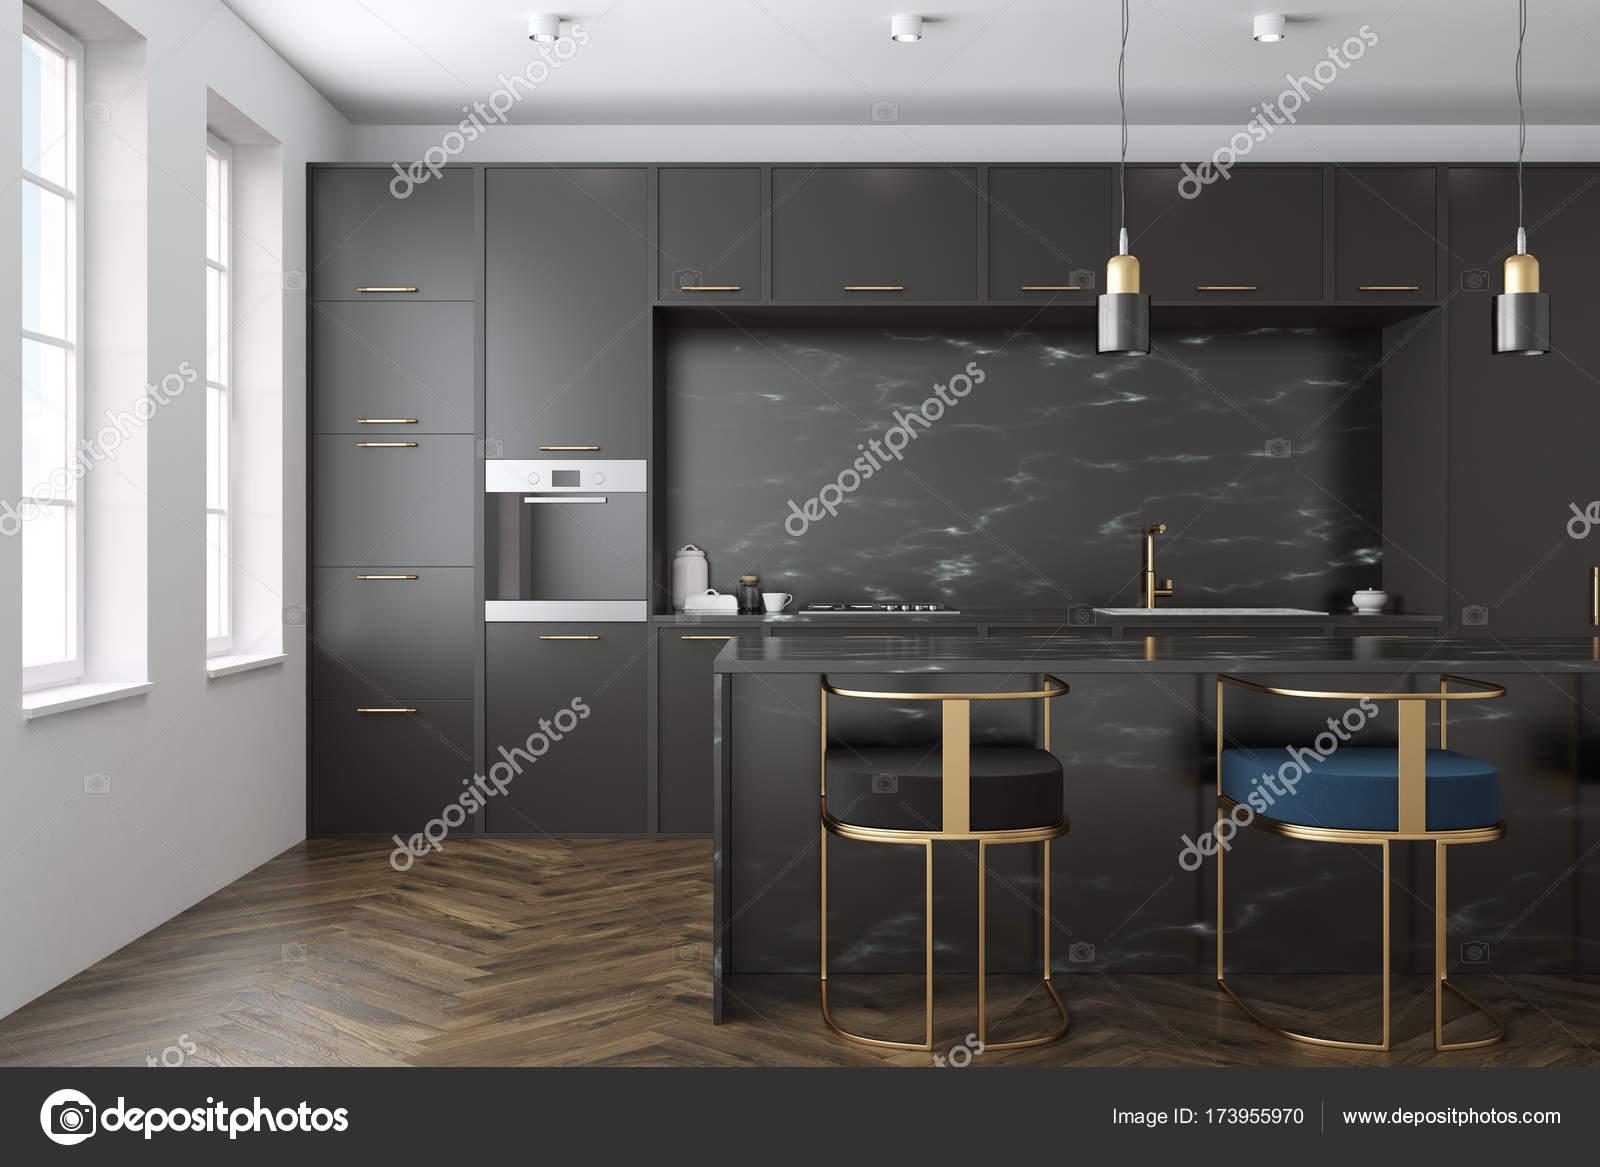 Schwarzer Marmor Kuche Interieur Stockfoto C Denisismagilov 173955970